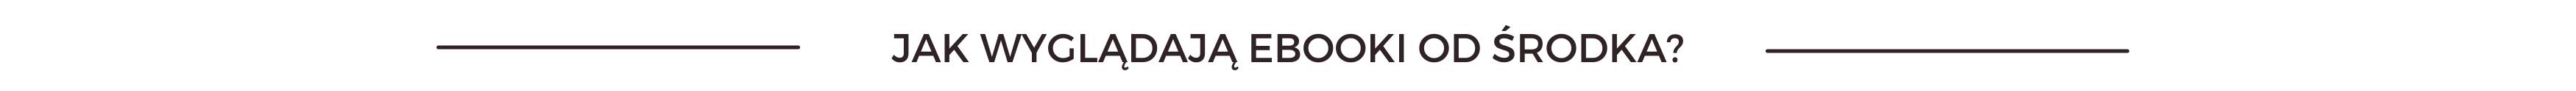 baner jak wyglądają ebooki